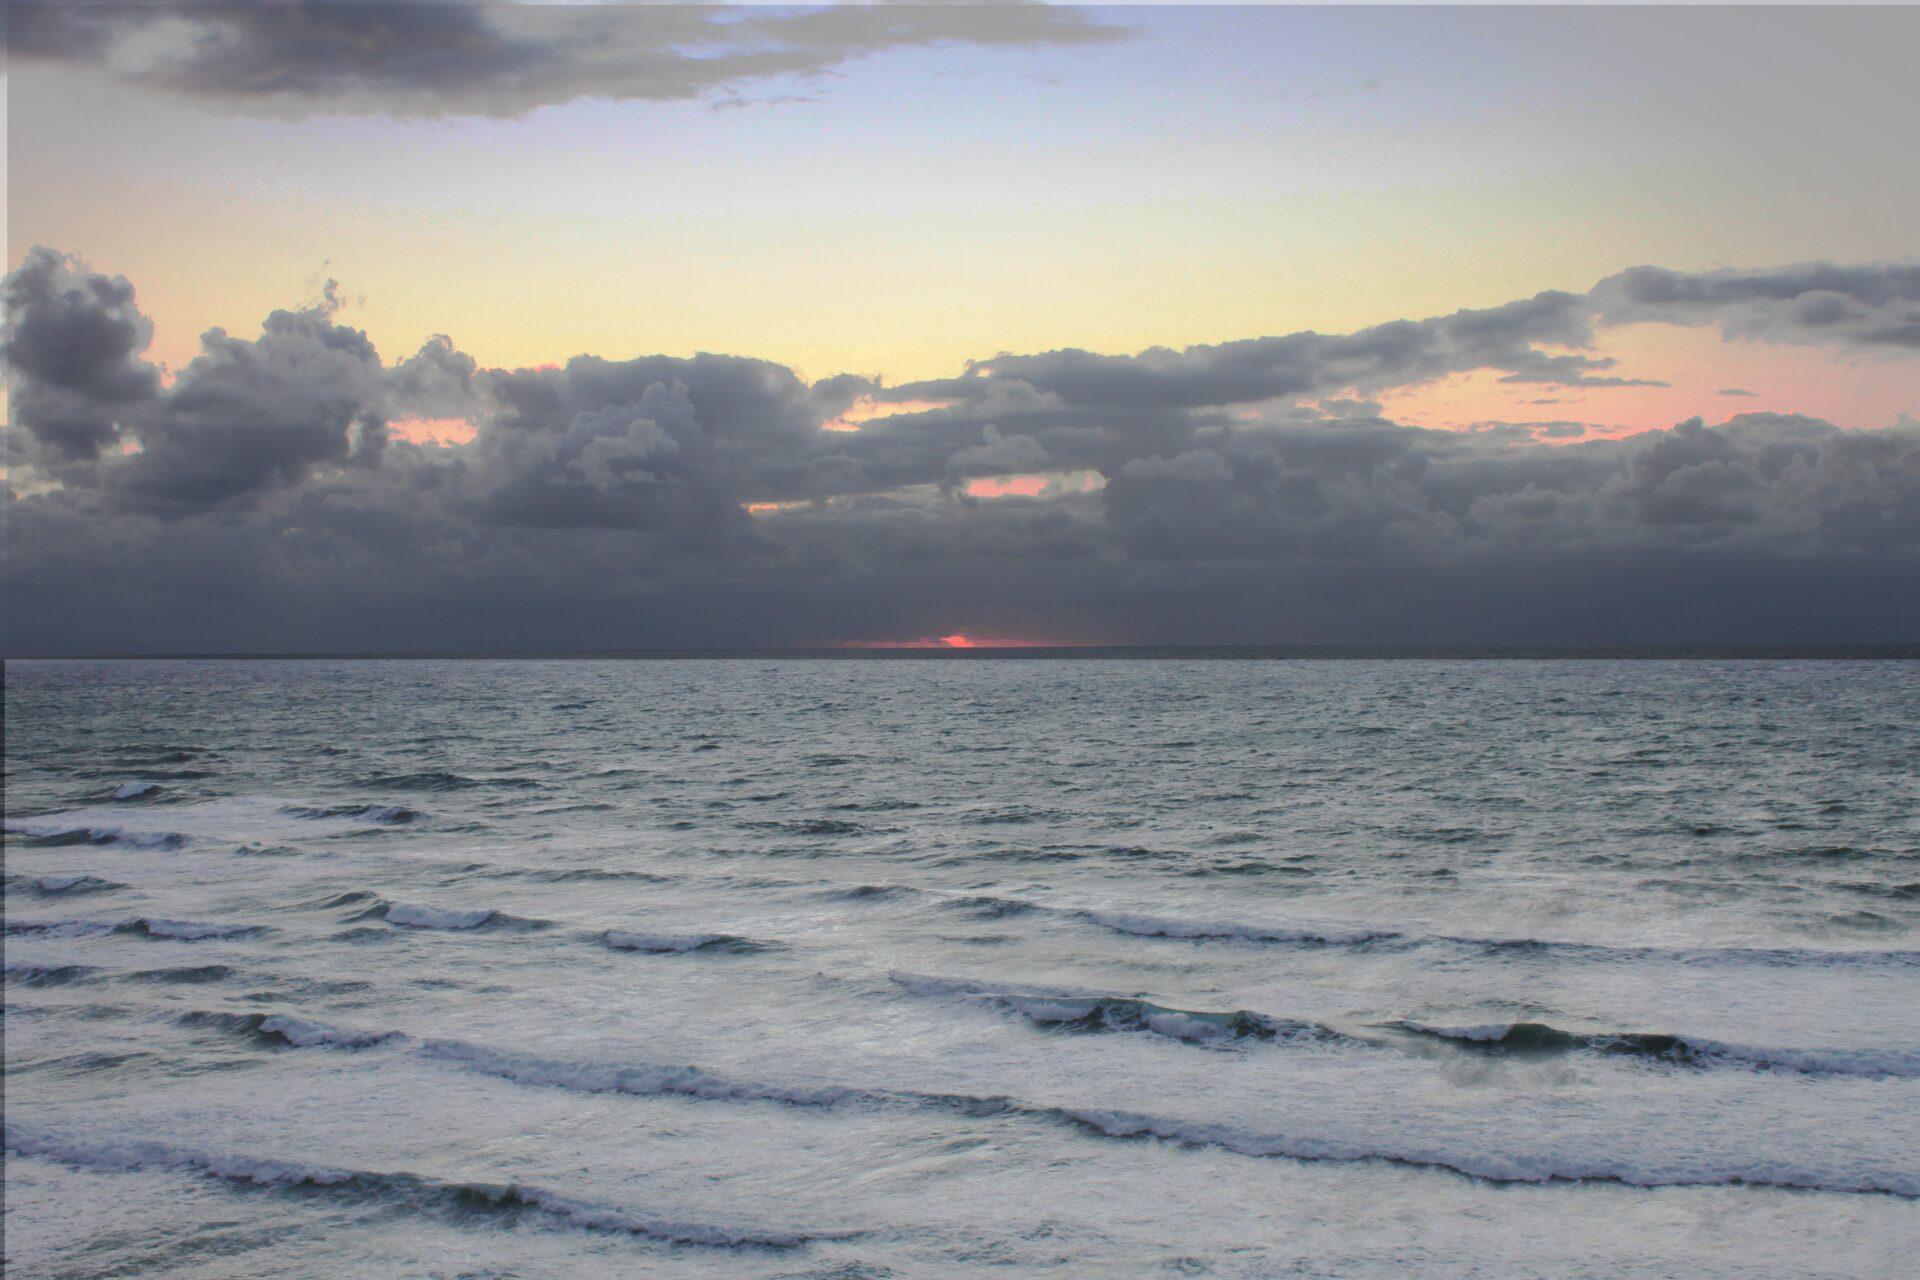 Seewetterbericht